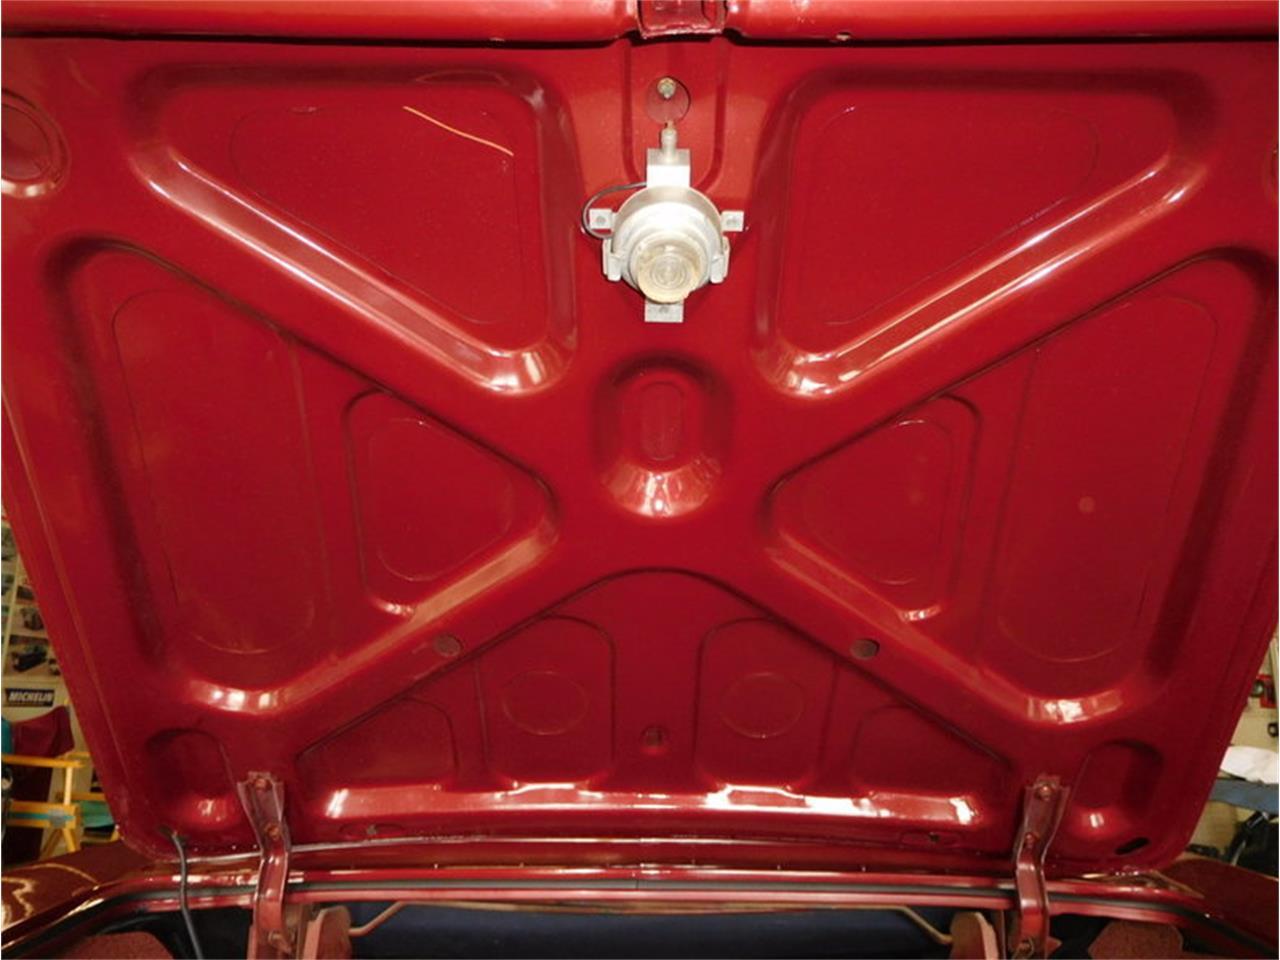 Large Picture of 1963 Pontiac Bonneville located in Alsip Illinois - LAZG